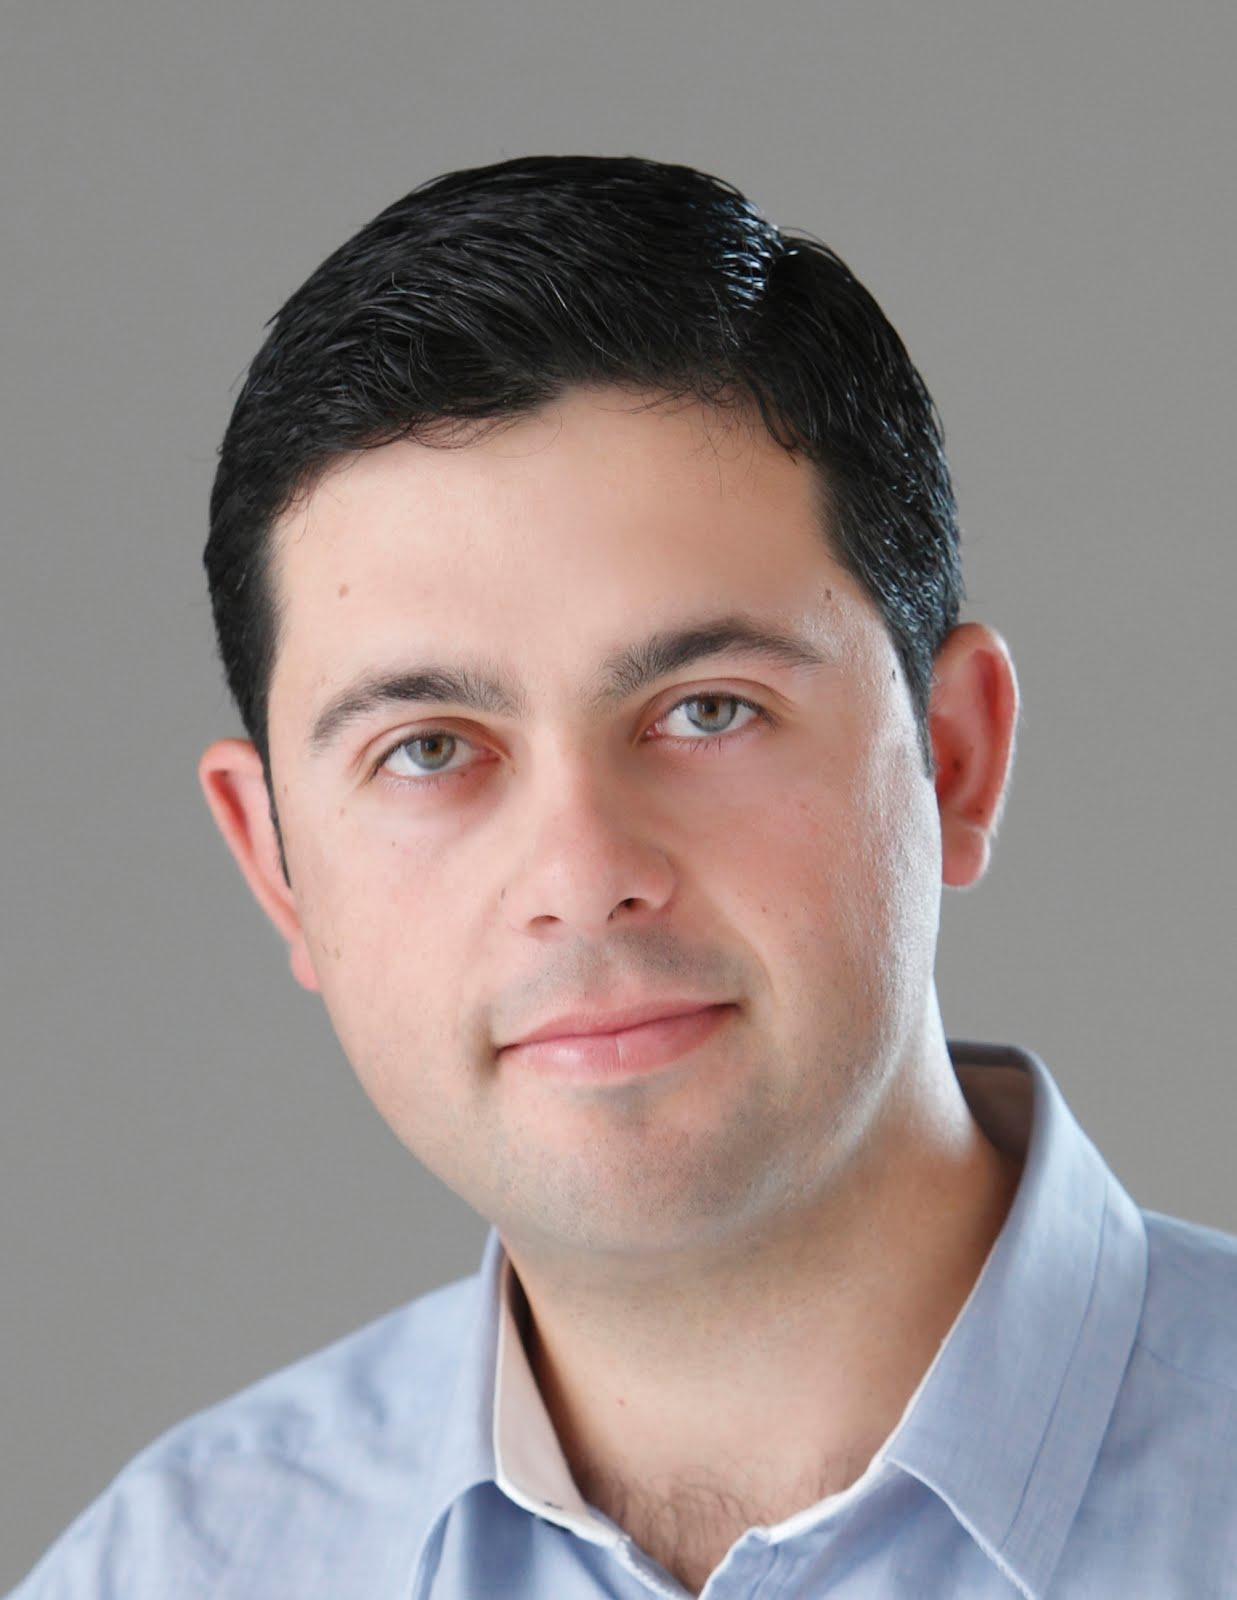 6.- Alberto Galindo Rosique